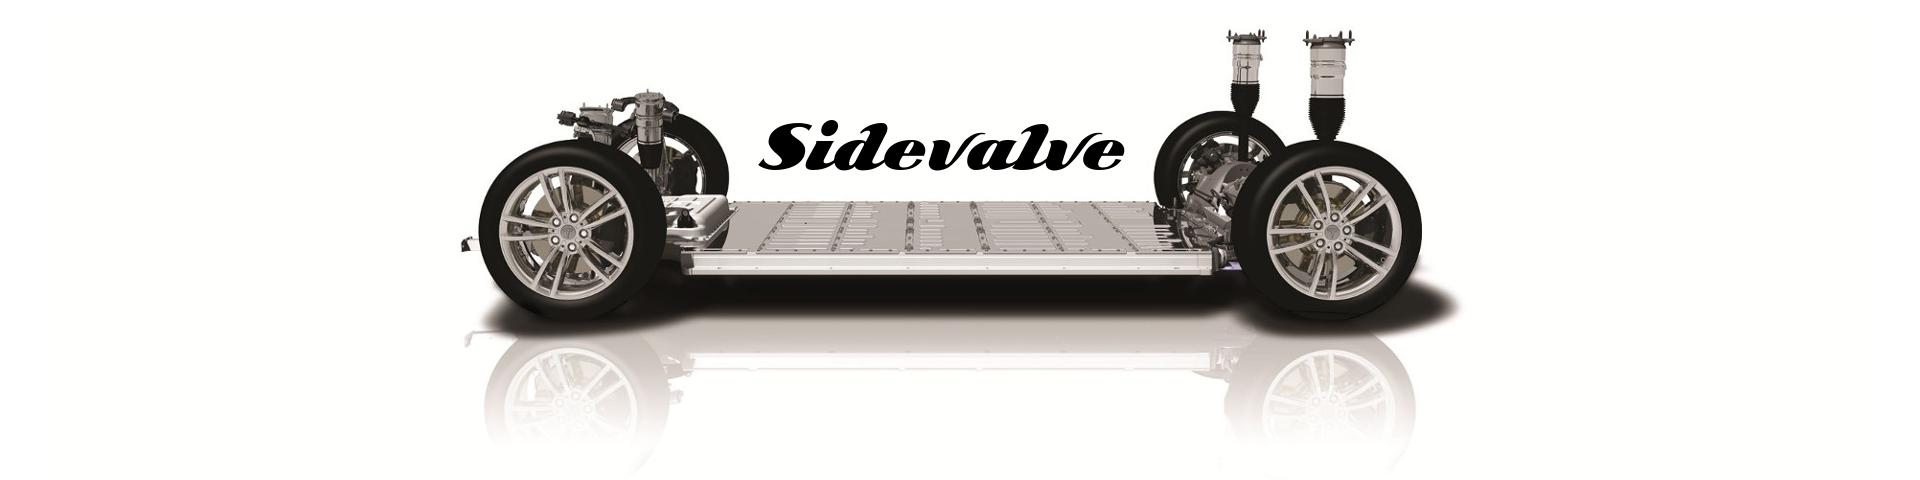 Sidevalve EV News